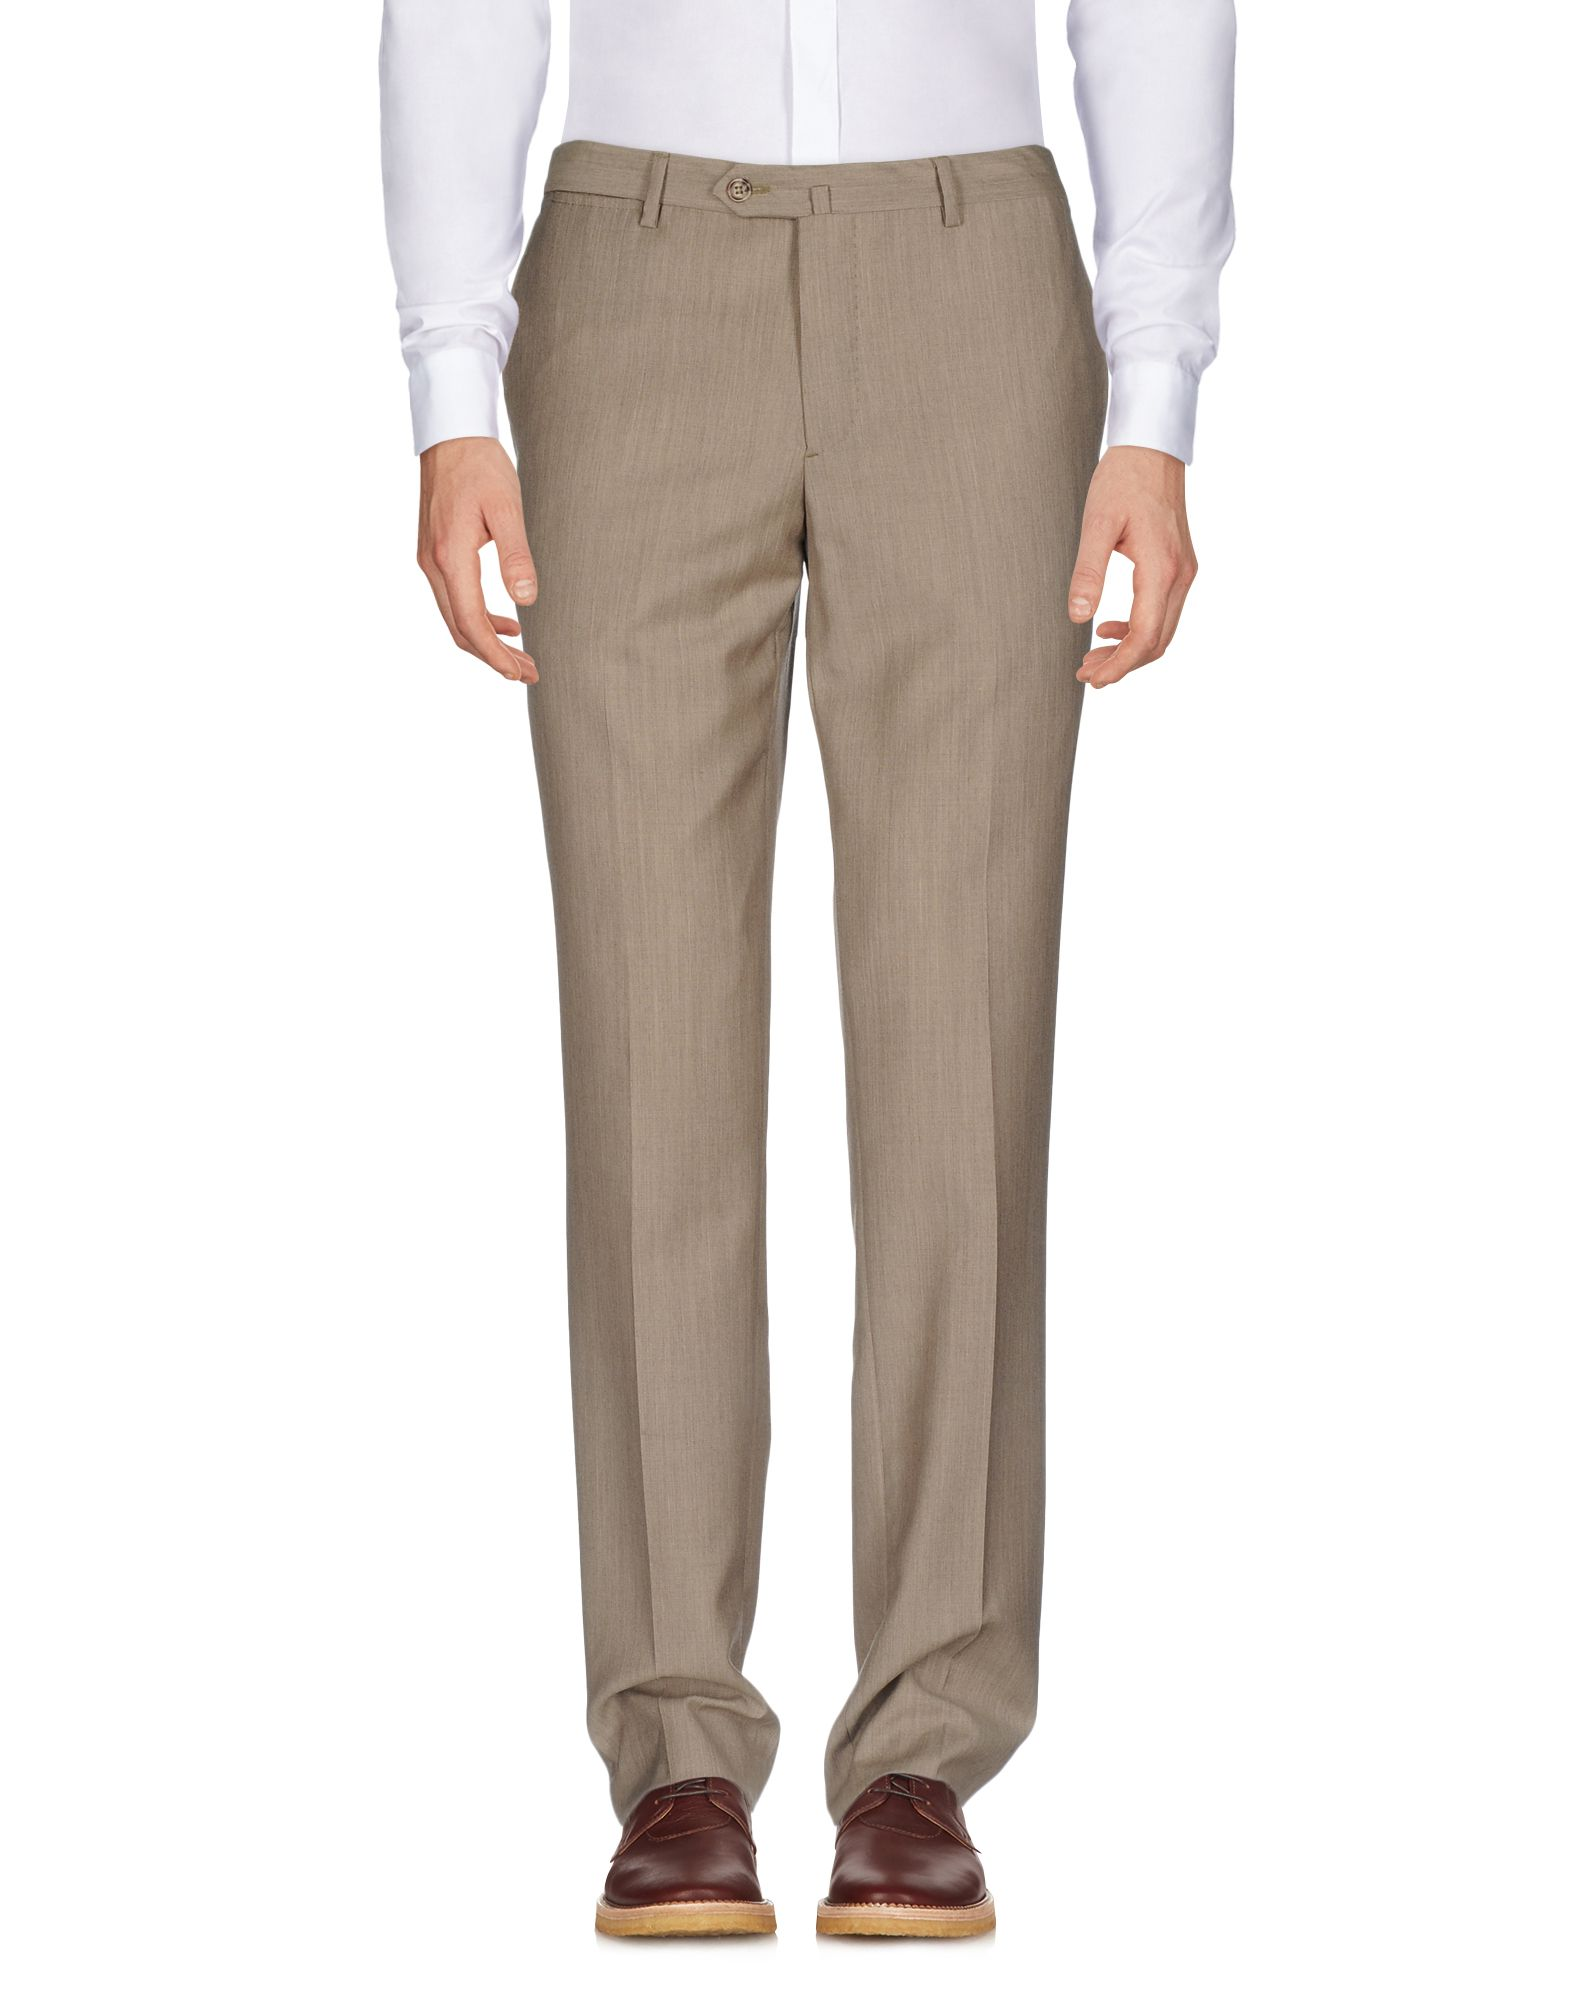 JASPER REED Повседневные брюки tombo 2010 aero reed d